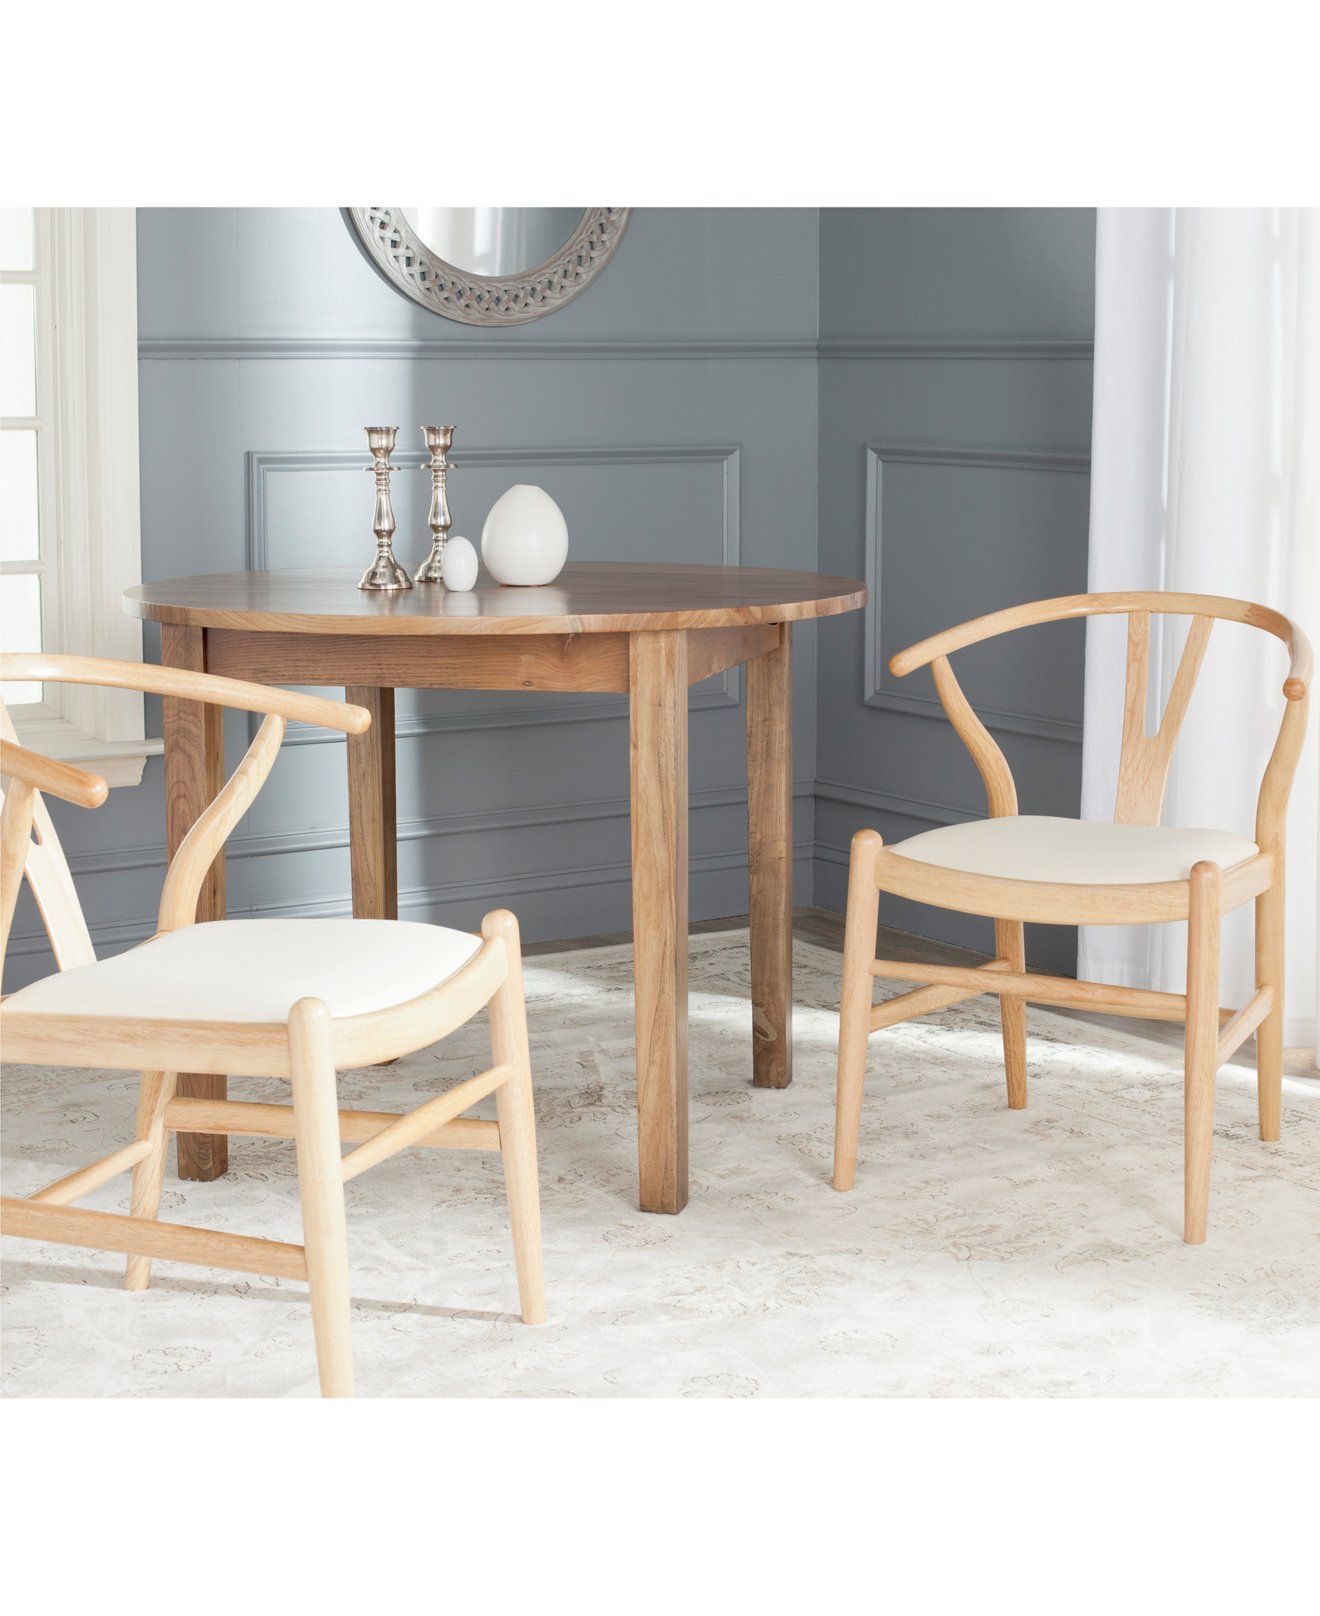 Nathan Set Of 2 Wishbone Dining Chairs, Quick Ship   Chairs U0026 Recliners    Furniture   Macyu0027s